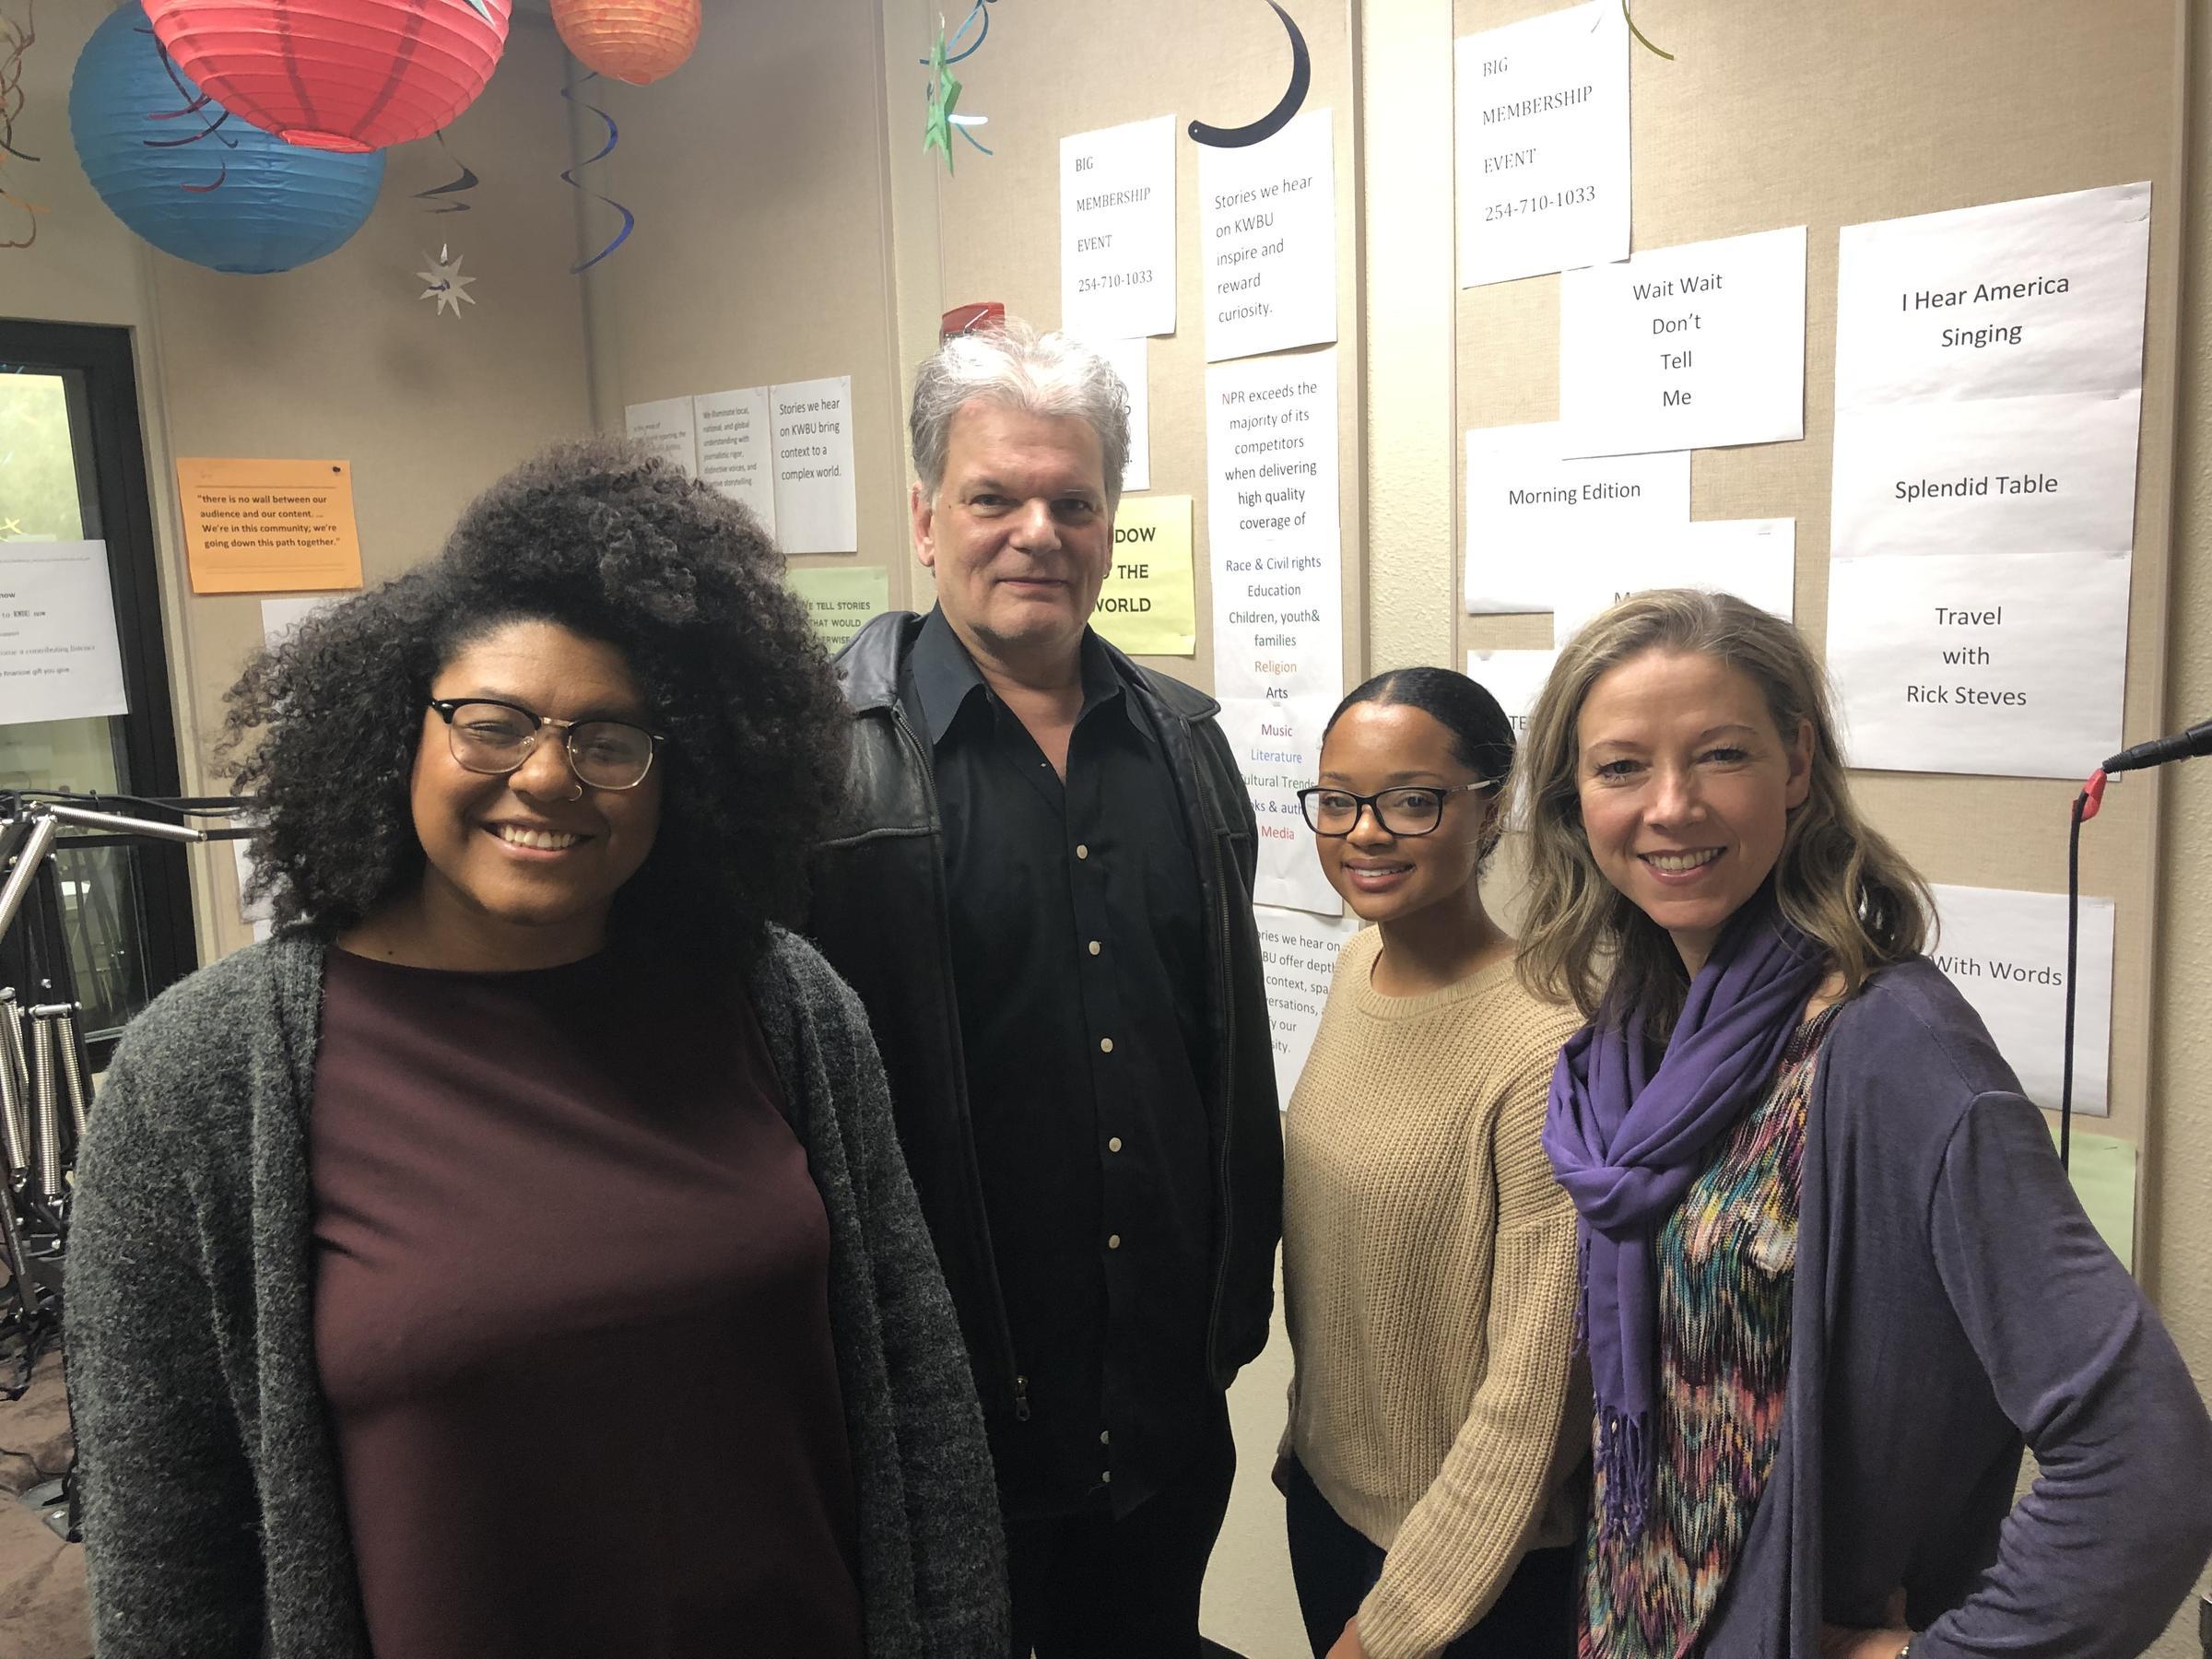 (From left to right) Rae Jefferson, Chuck Jennings, Kennedy Sam and Fiona Bond in the KWBU Studios on Jan. 15, 2019.  (KATELEIGH MILLS/KWBU RADIO)